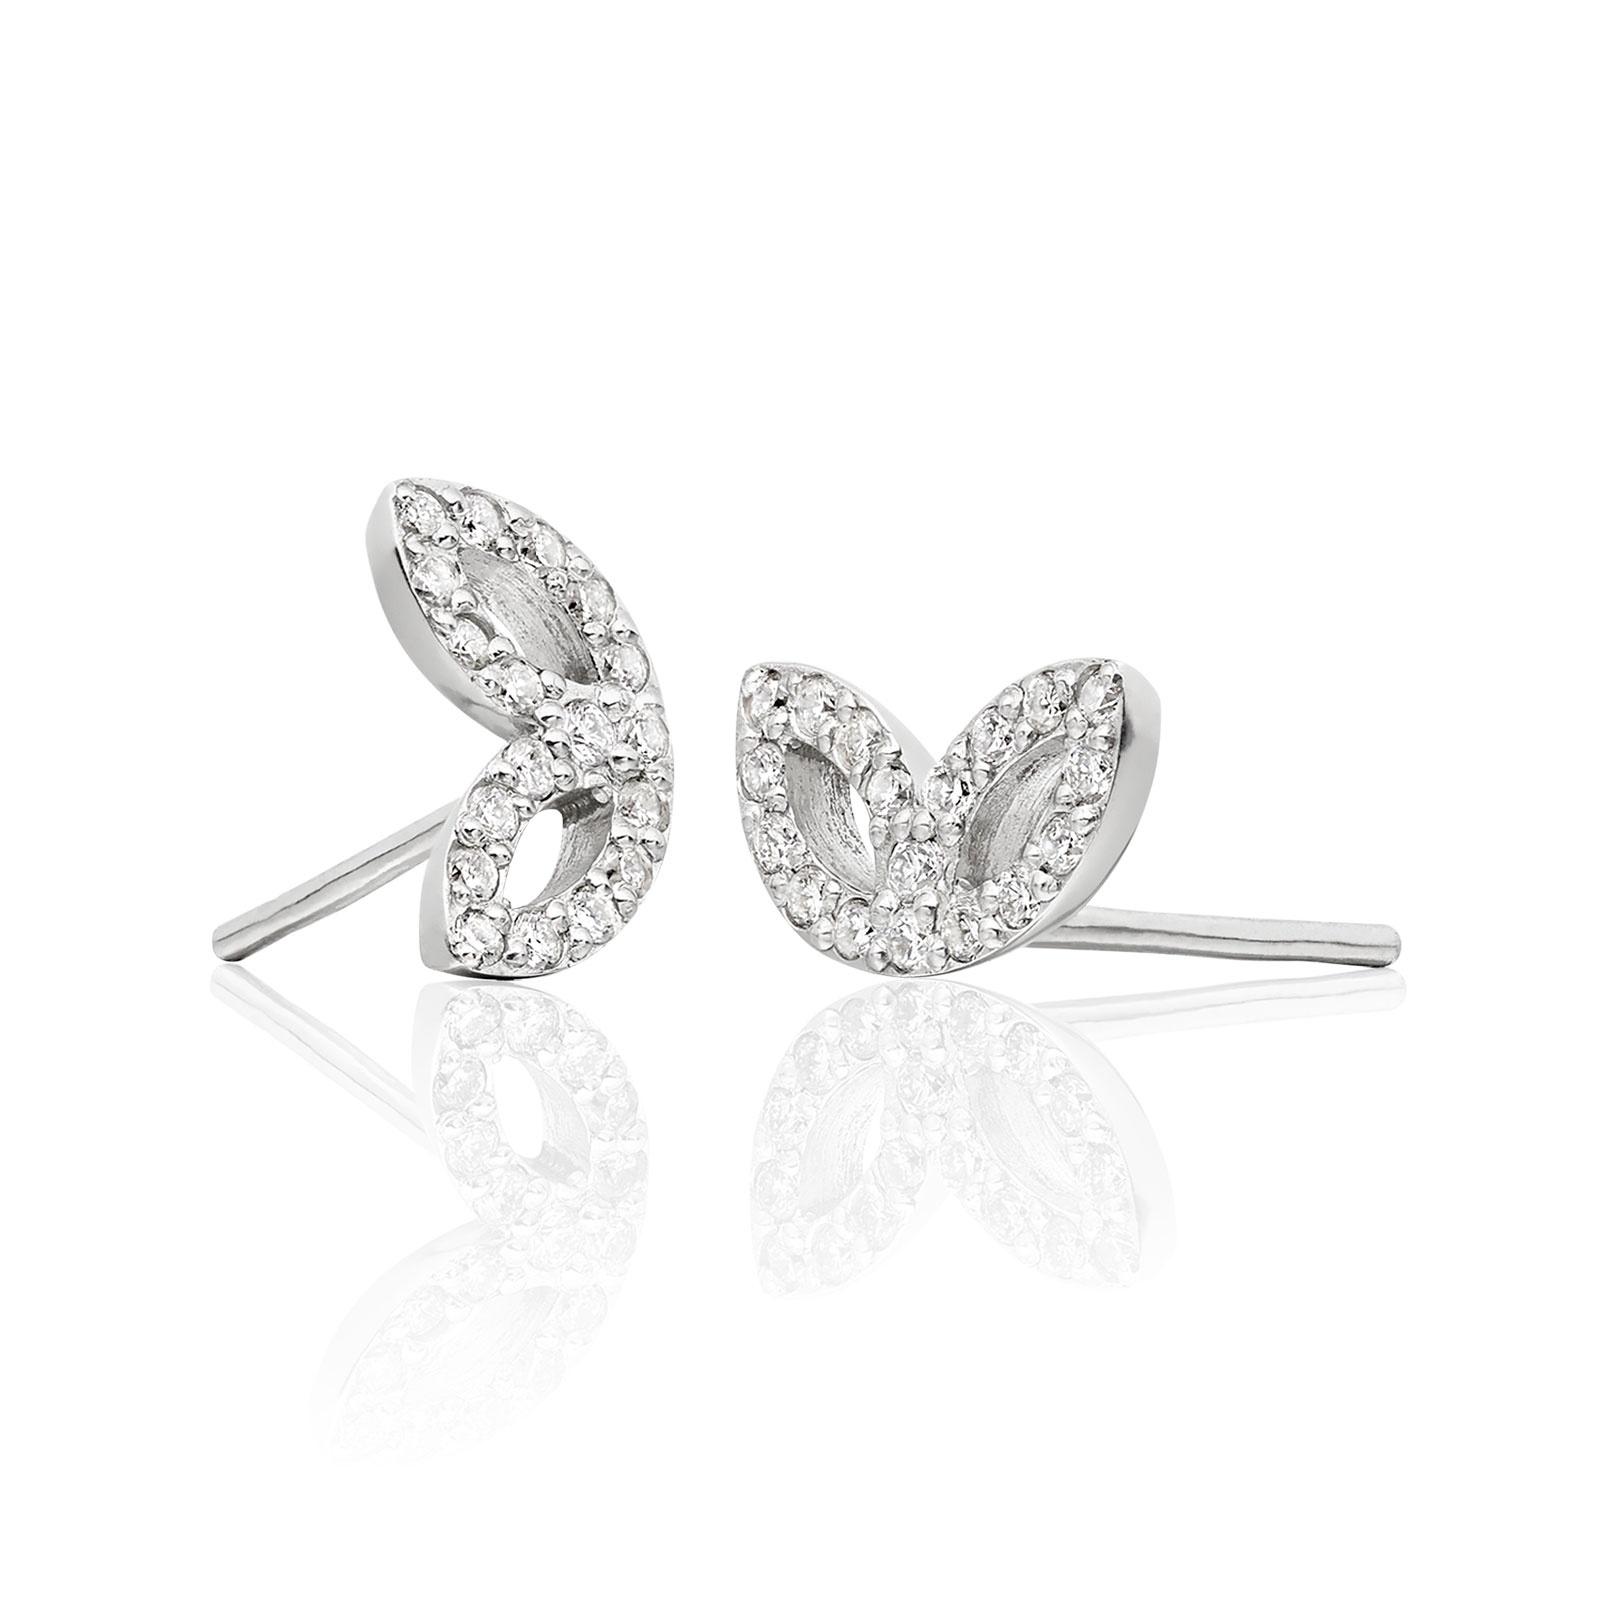 Enchanted Diamond Stud Earrings in White Gold-EADIWG0416-1